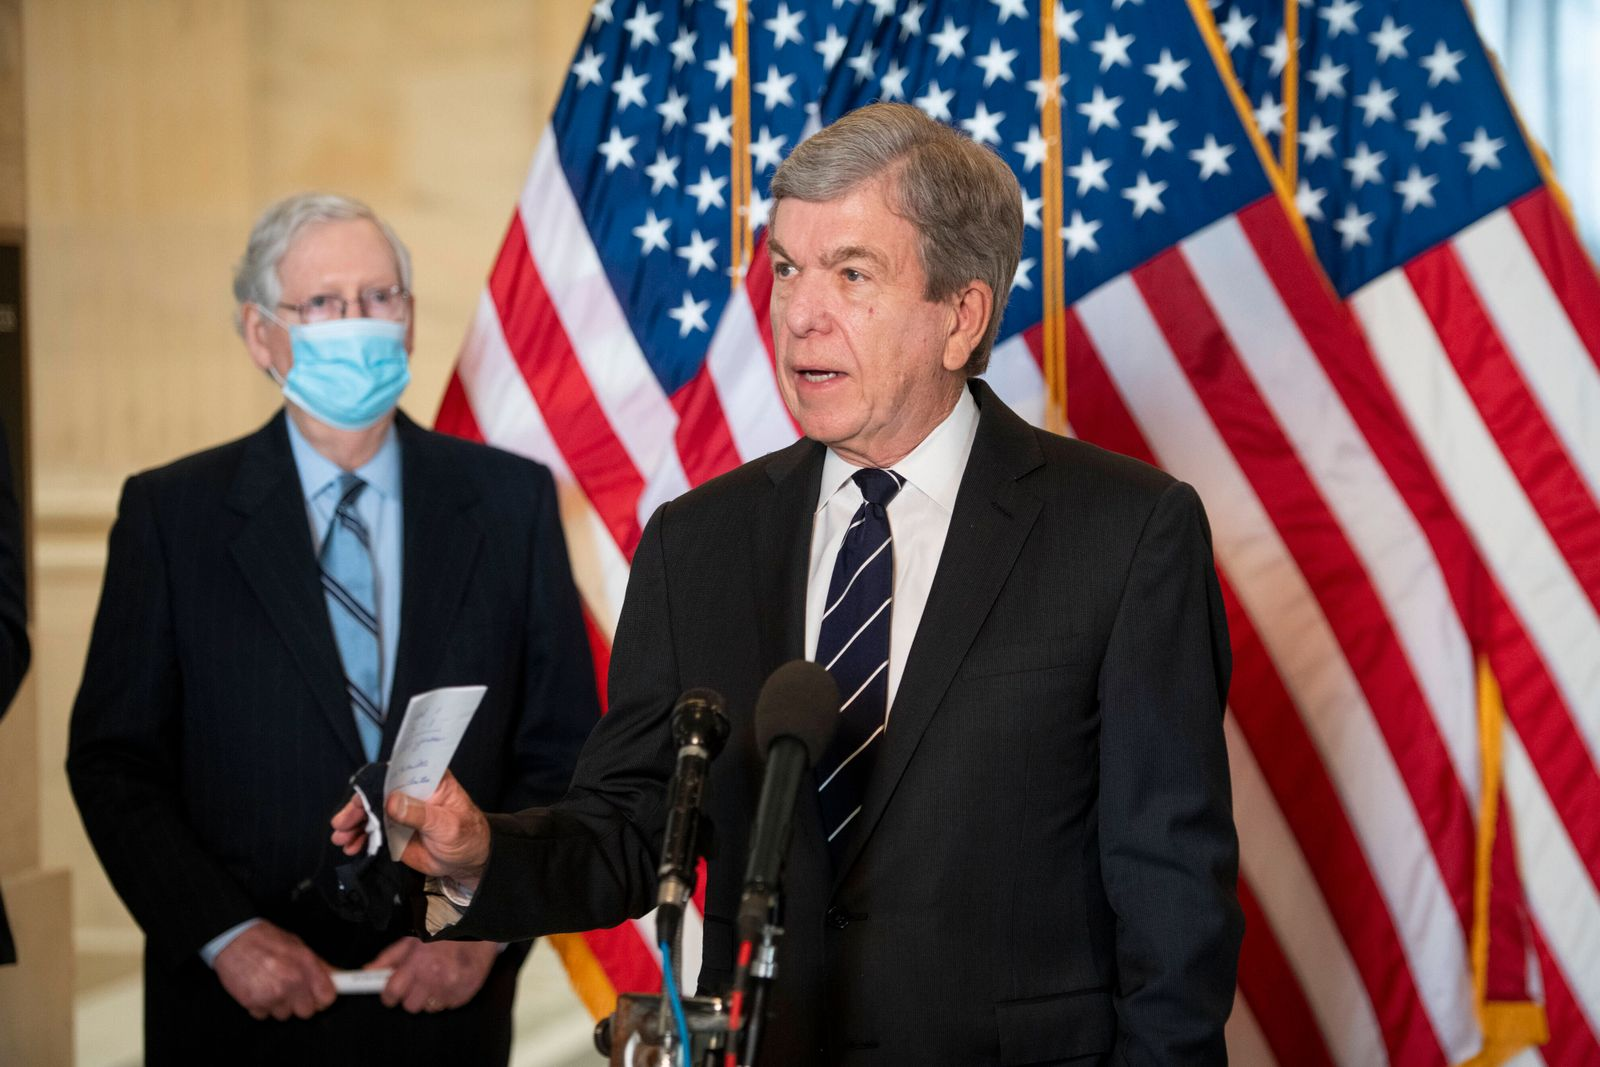 March 23, 2021, Washington, District of Columbia, USA: United States Senator Roy Blunt (Republican of Missouri) offers r